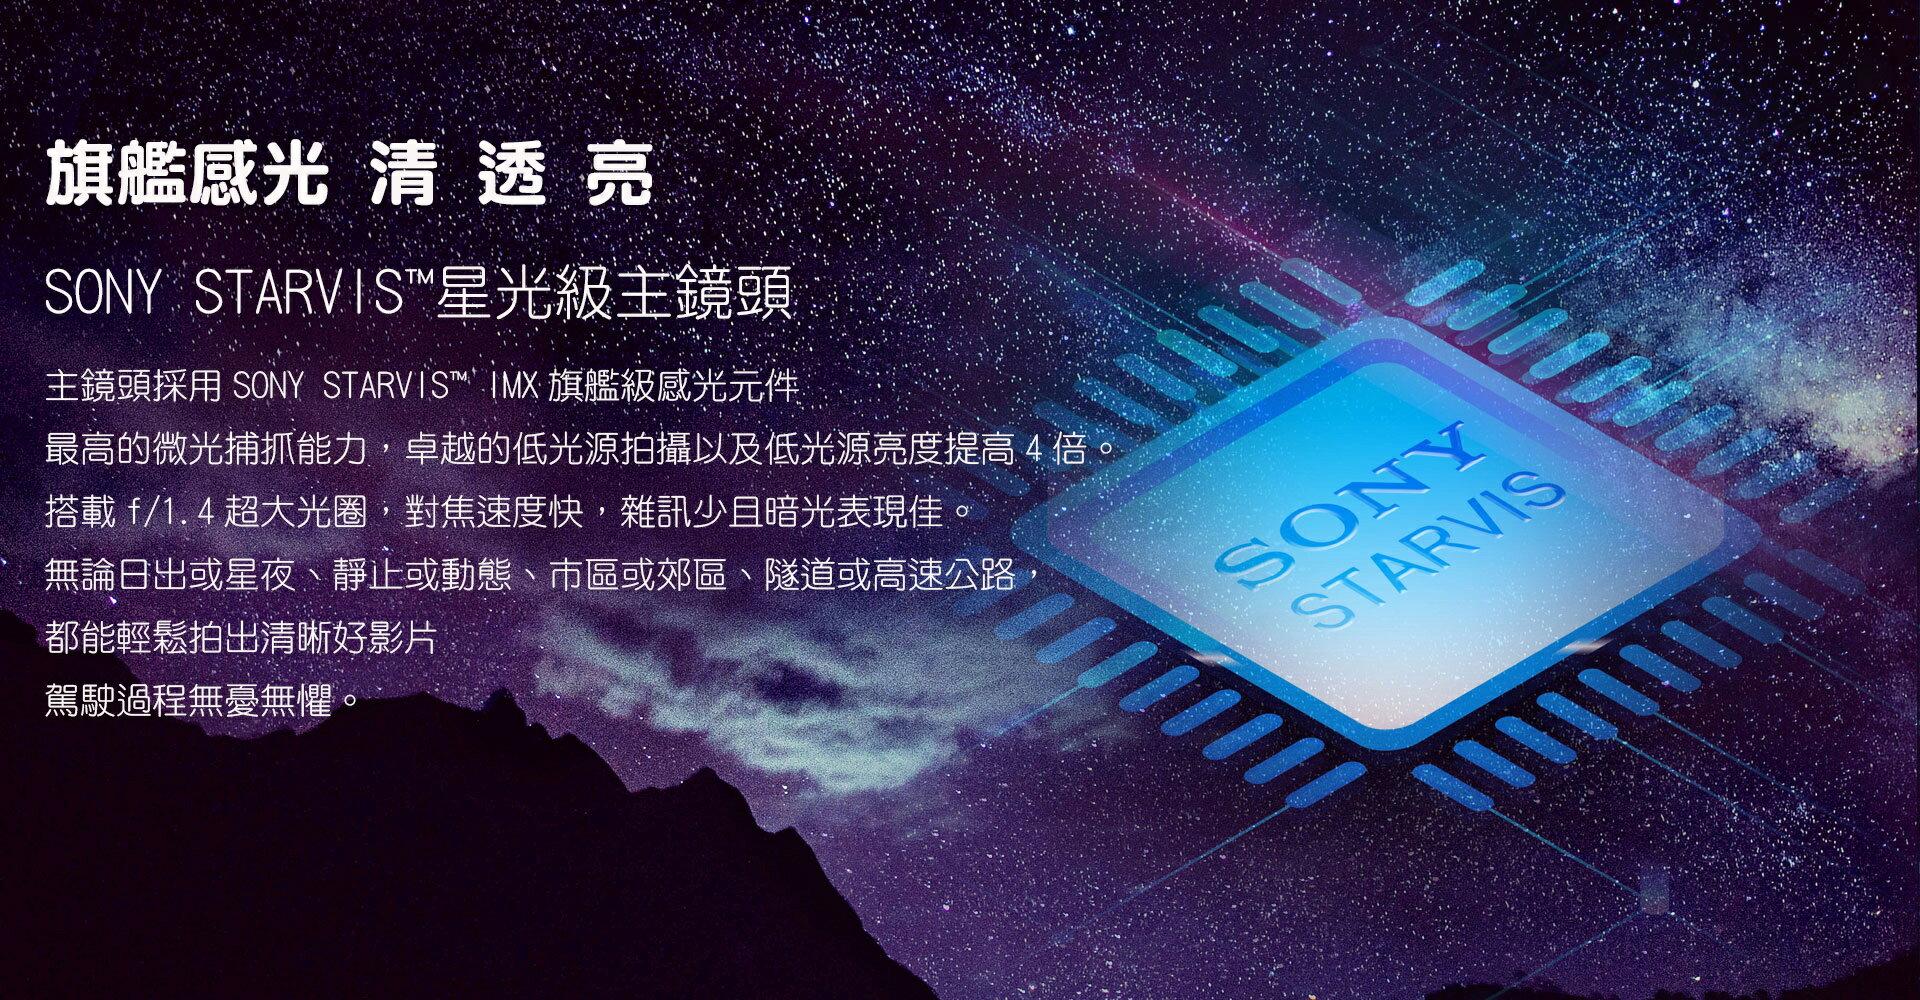 MASI S528D【含安裝加送64G】夜視旗艦 GPS/WIFI 雙鏡頭行車記錄器 前後鏡頭行車紀錄器 SONY感光元件 區間測速 保固三年